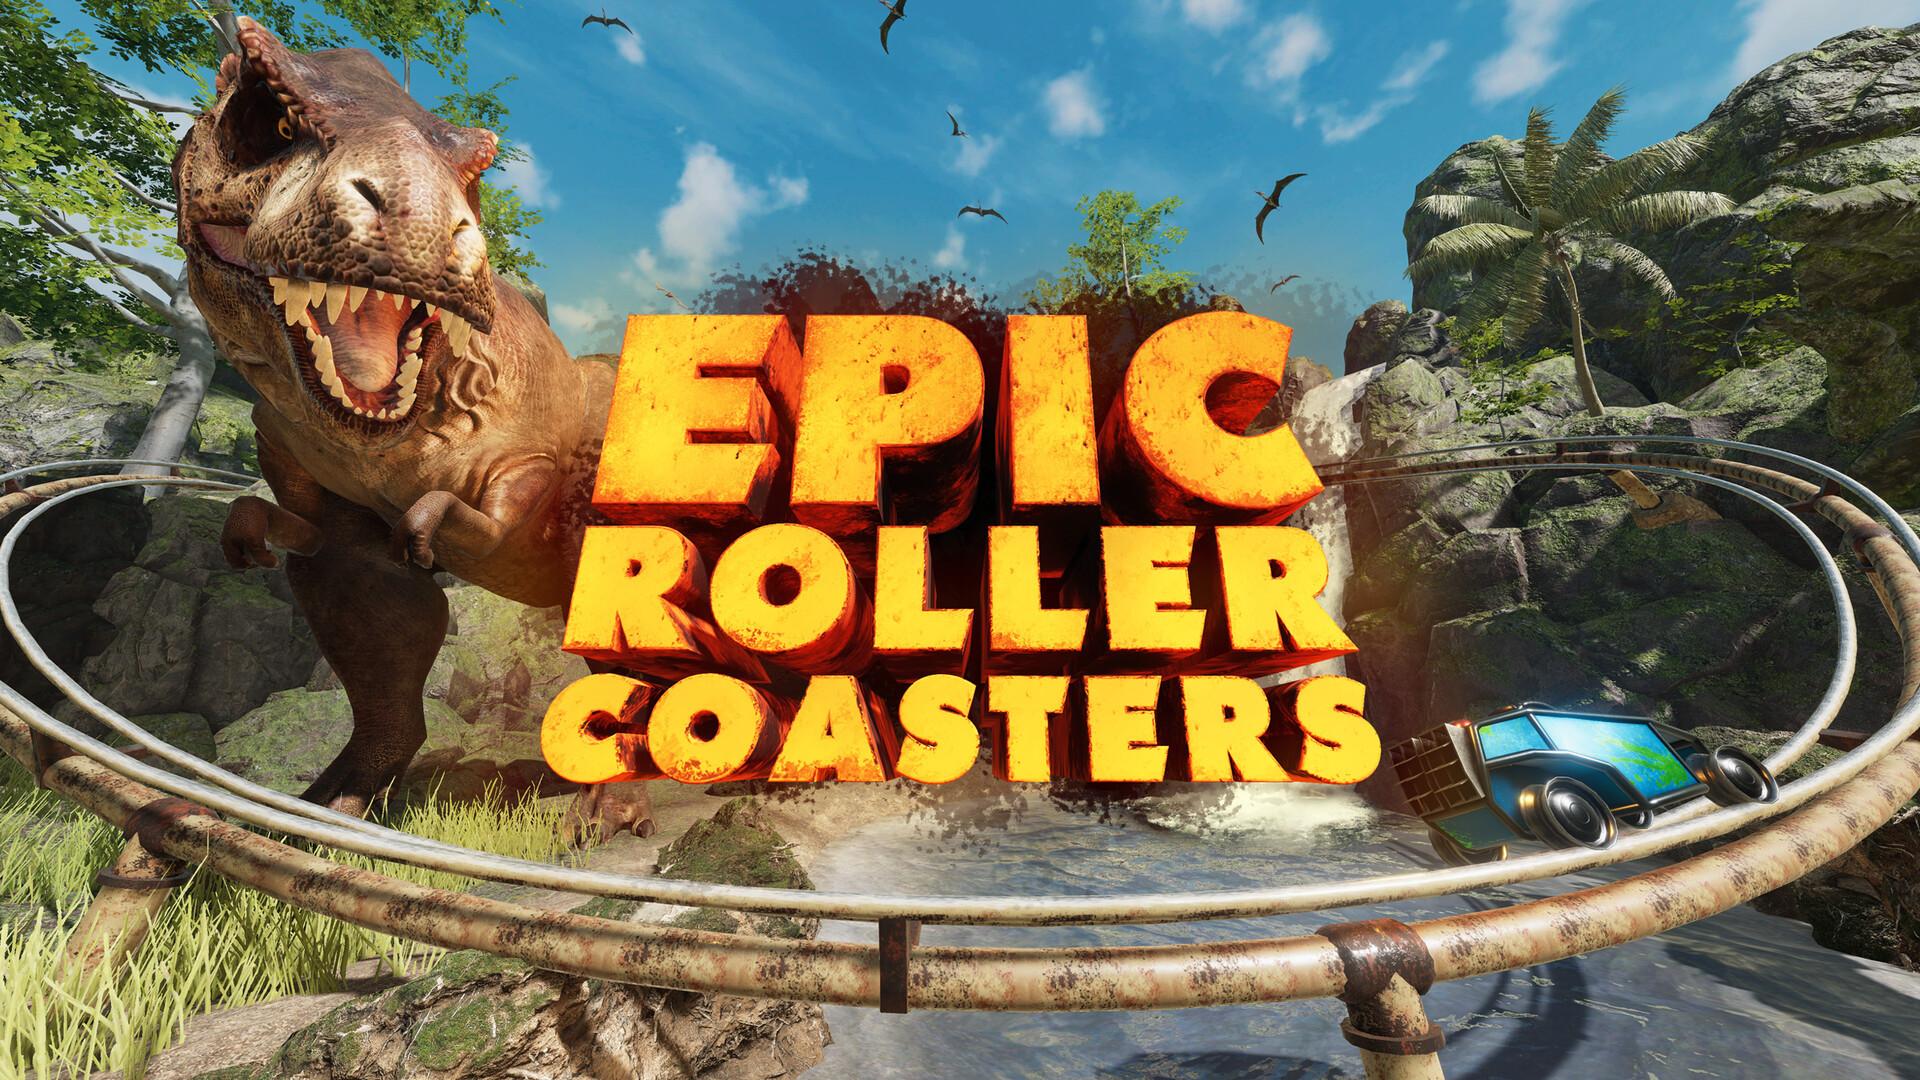 roller coaster vr.jpg